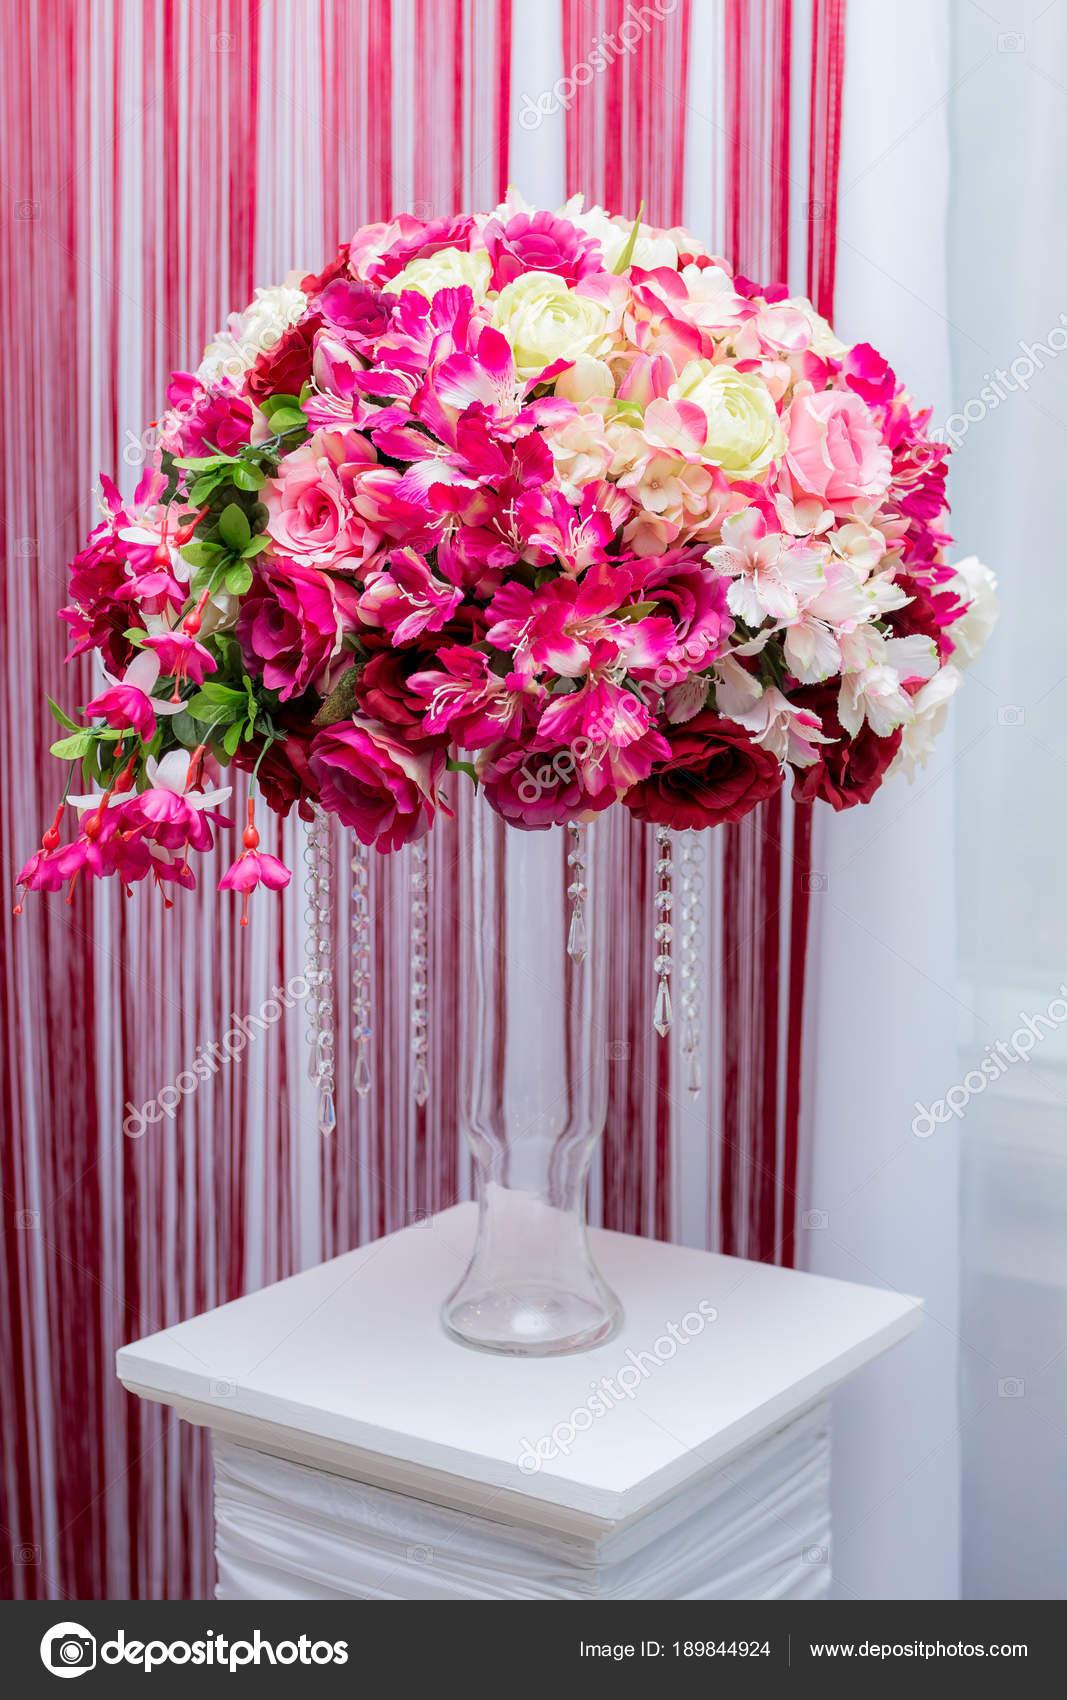 wedding decor ball of flowers — Stock Photo © DenysVynnyk #189844924